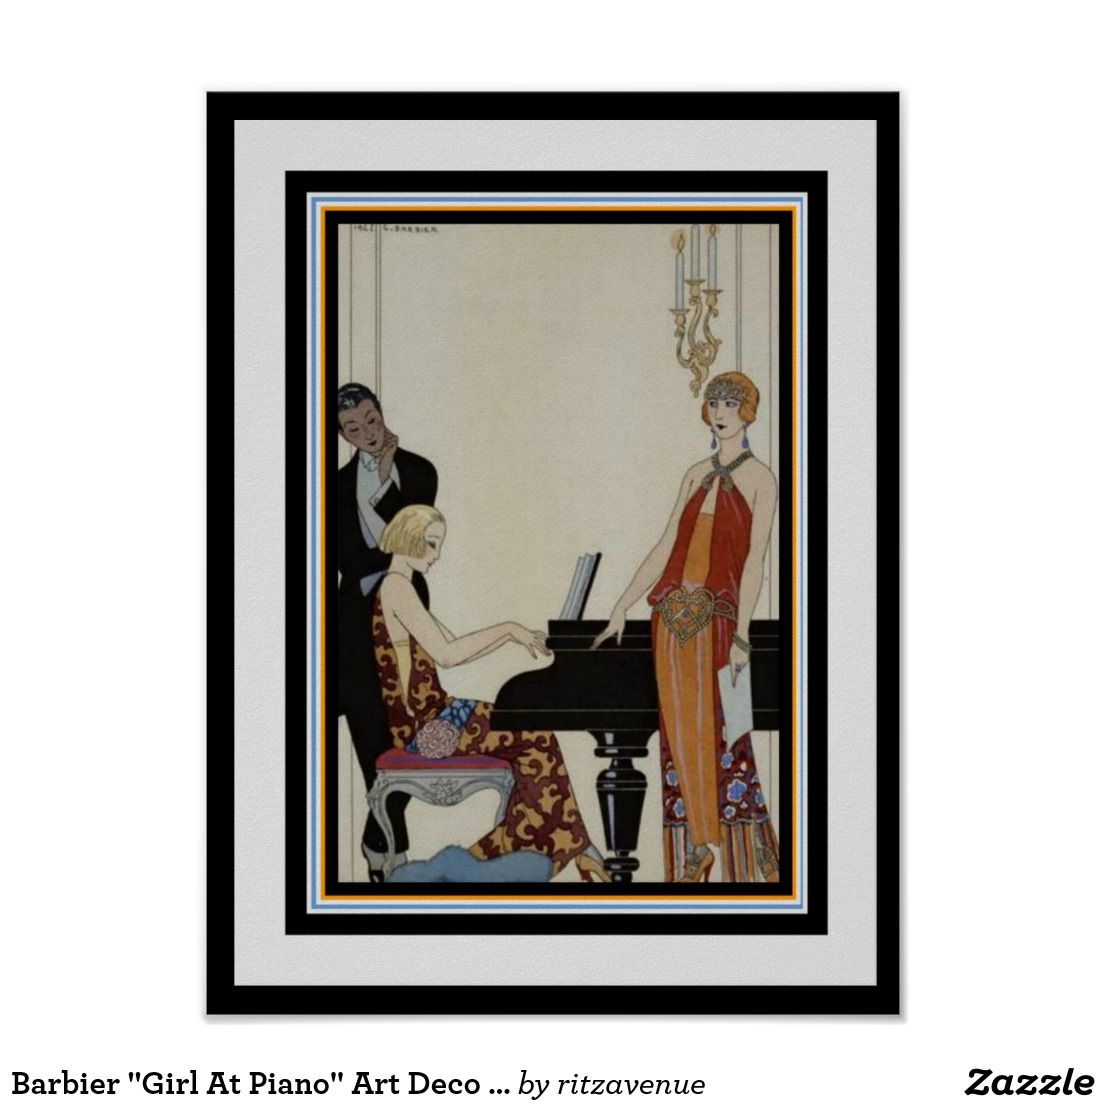 Barbier girl at piano art deco poster 12 x 16 for Piani art deco